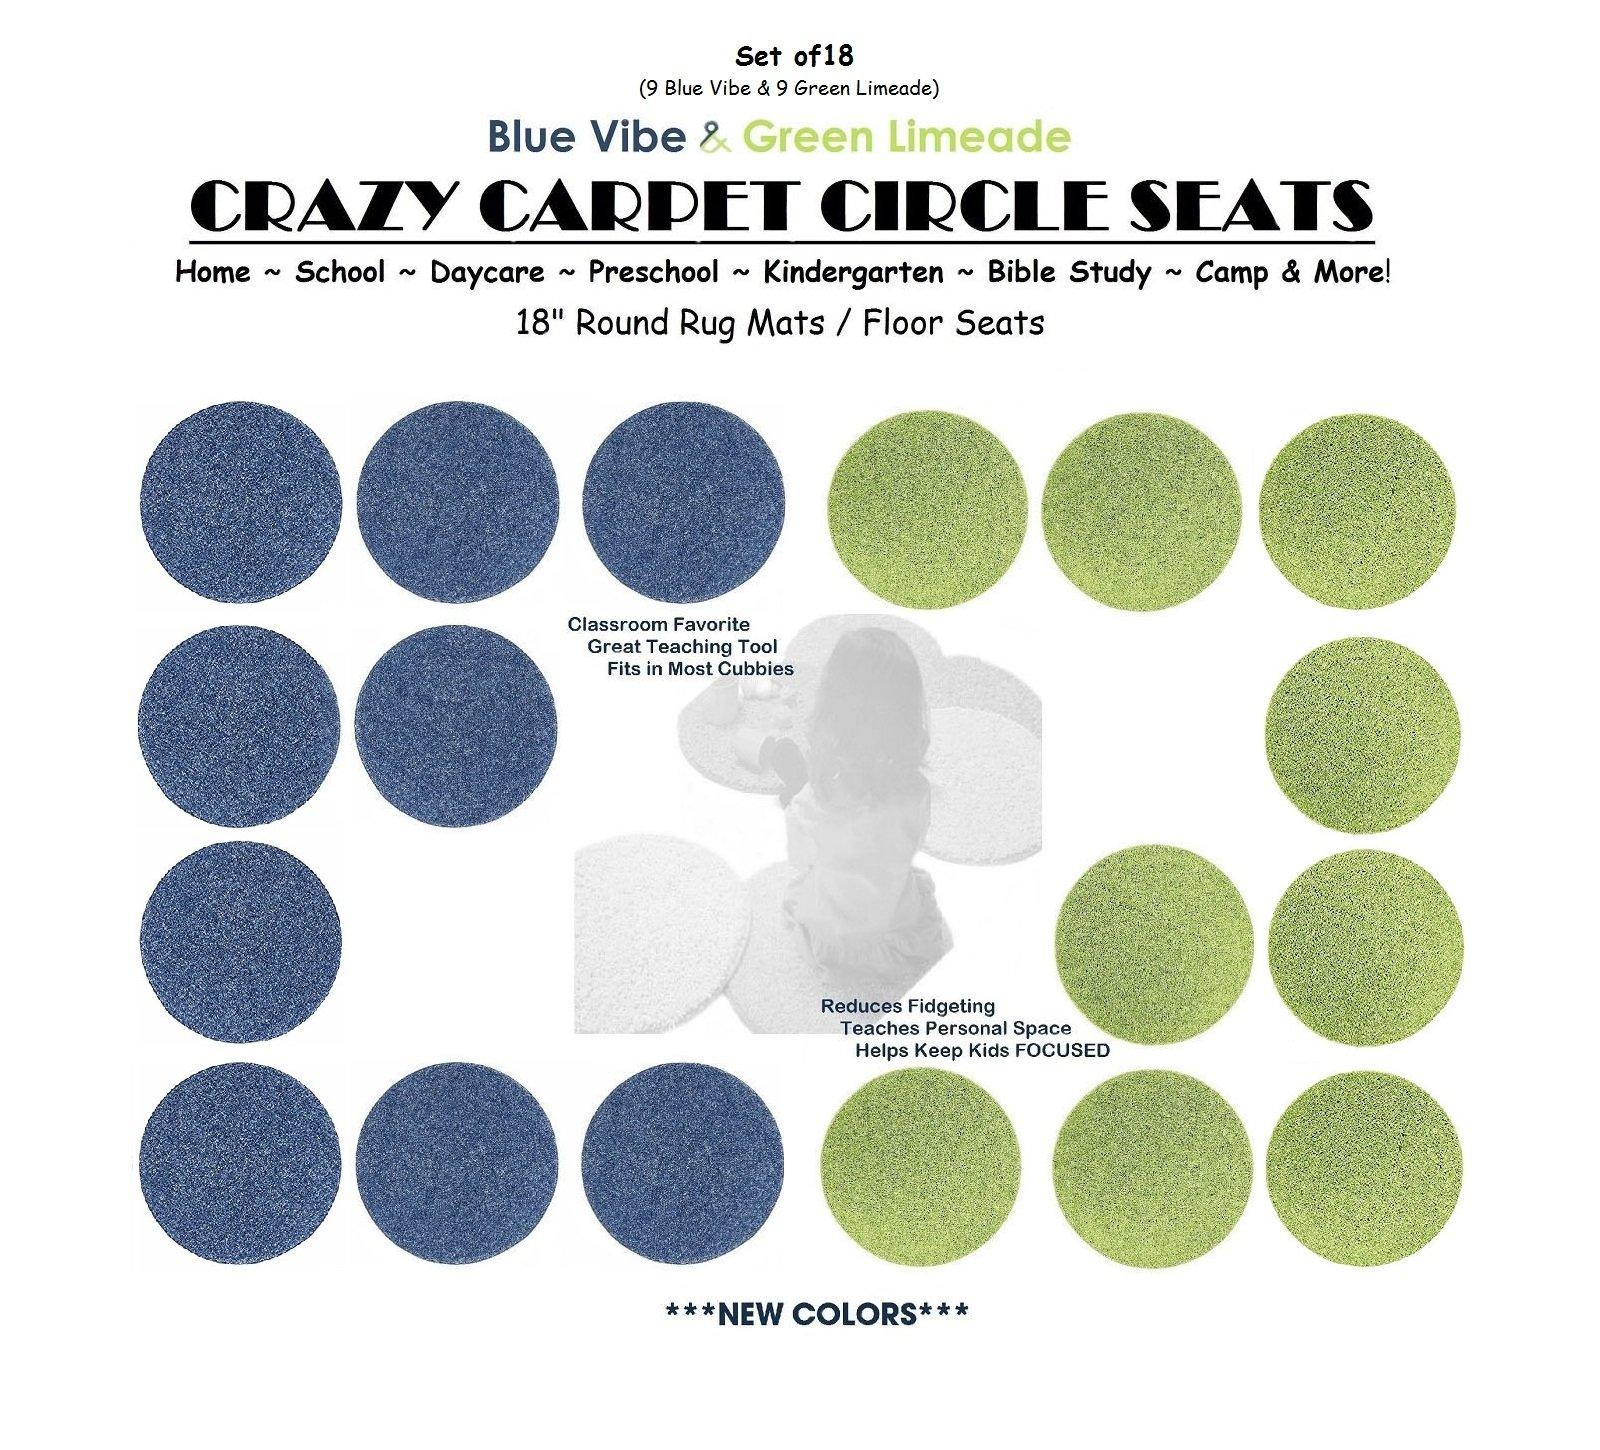 CHILDREN'S CRAZY CARPET CIRCLE SEATS - Blue Vibe & Green Limeade Set | 18'' Round Rug Mats / Floor Seats SCHOOL & HOME Favorite (Set of 18 Seats - 9 Blue/ 9 Green)